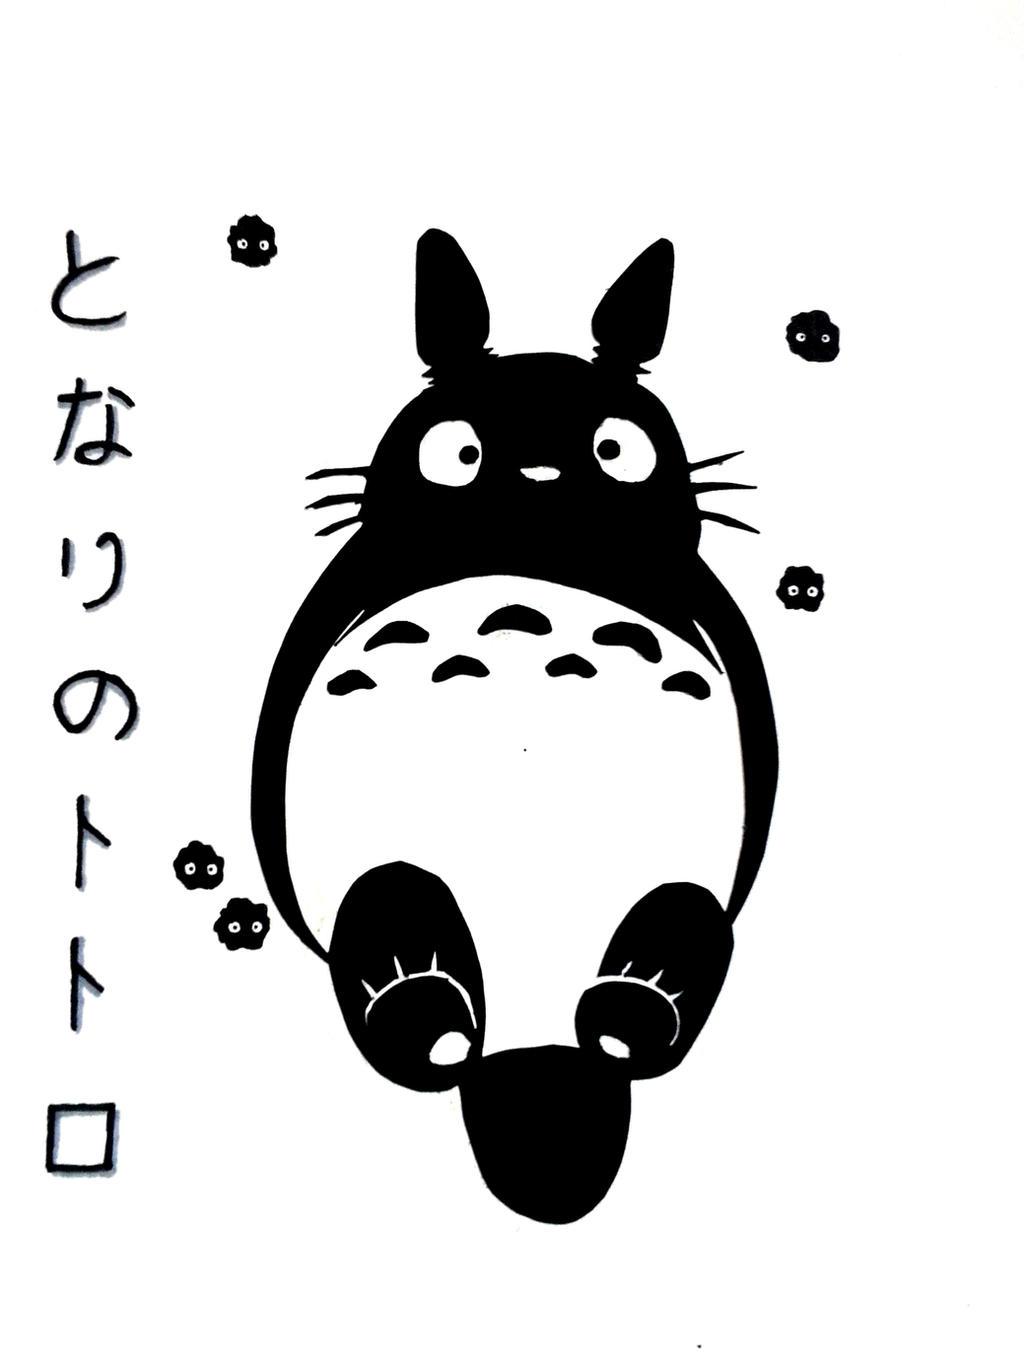 Black And White Totoro Wallpaper | www.imgkid.com - The ...